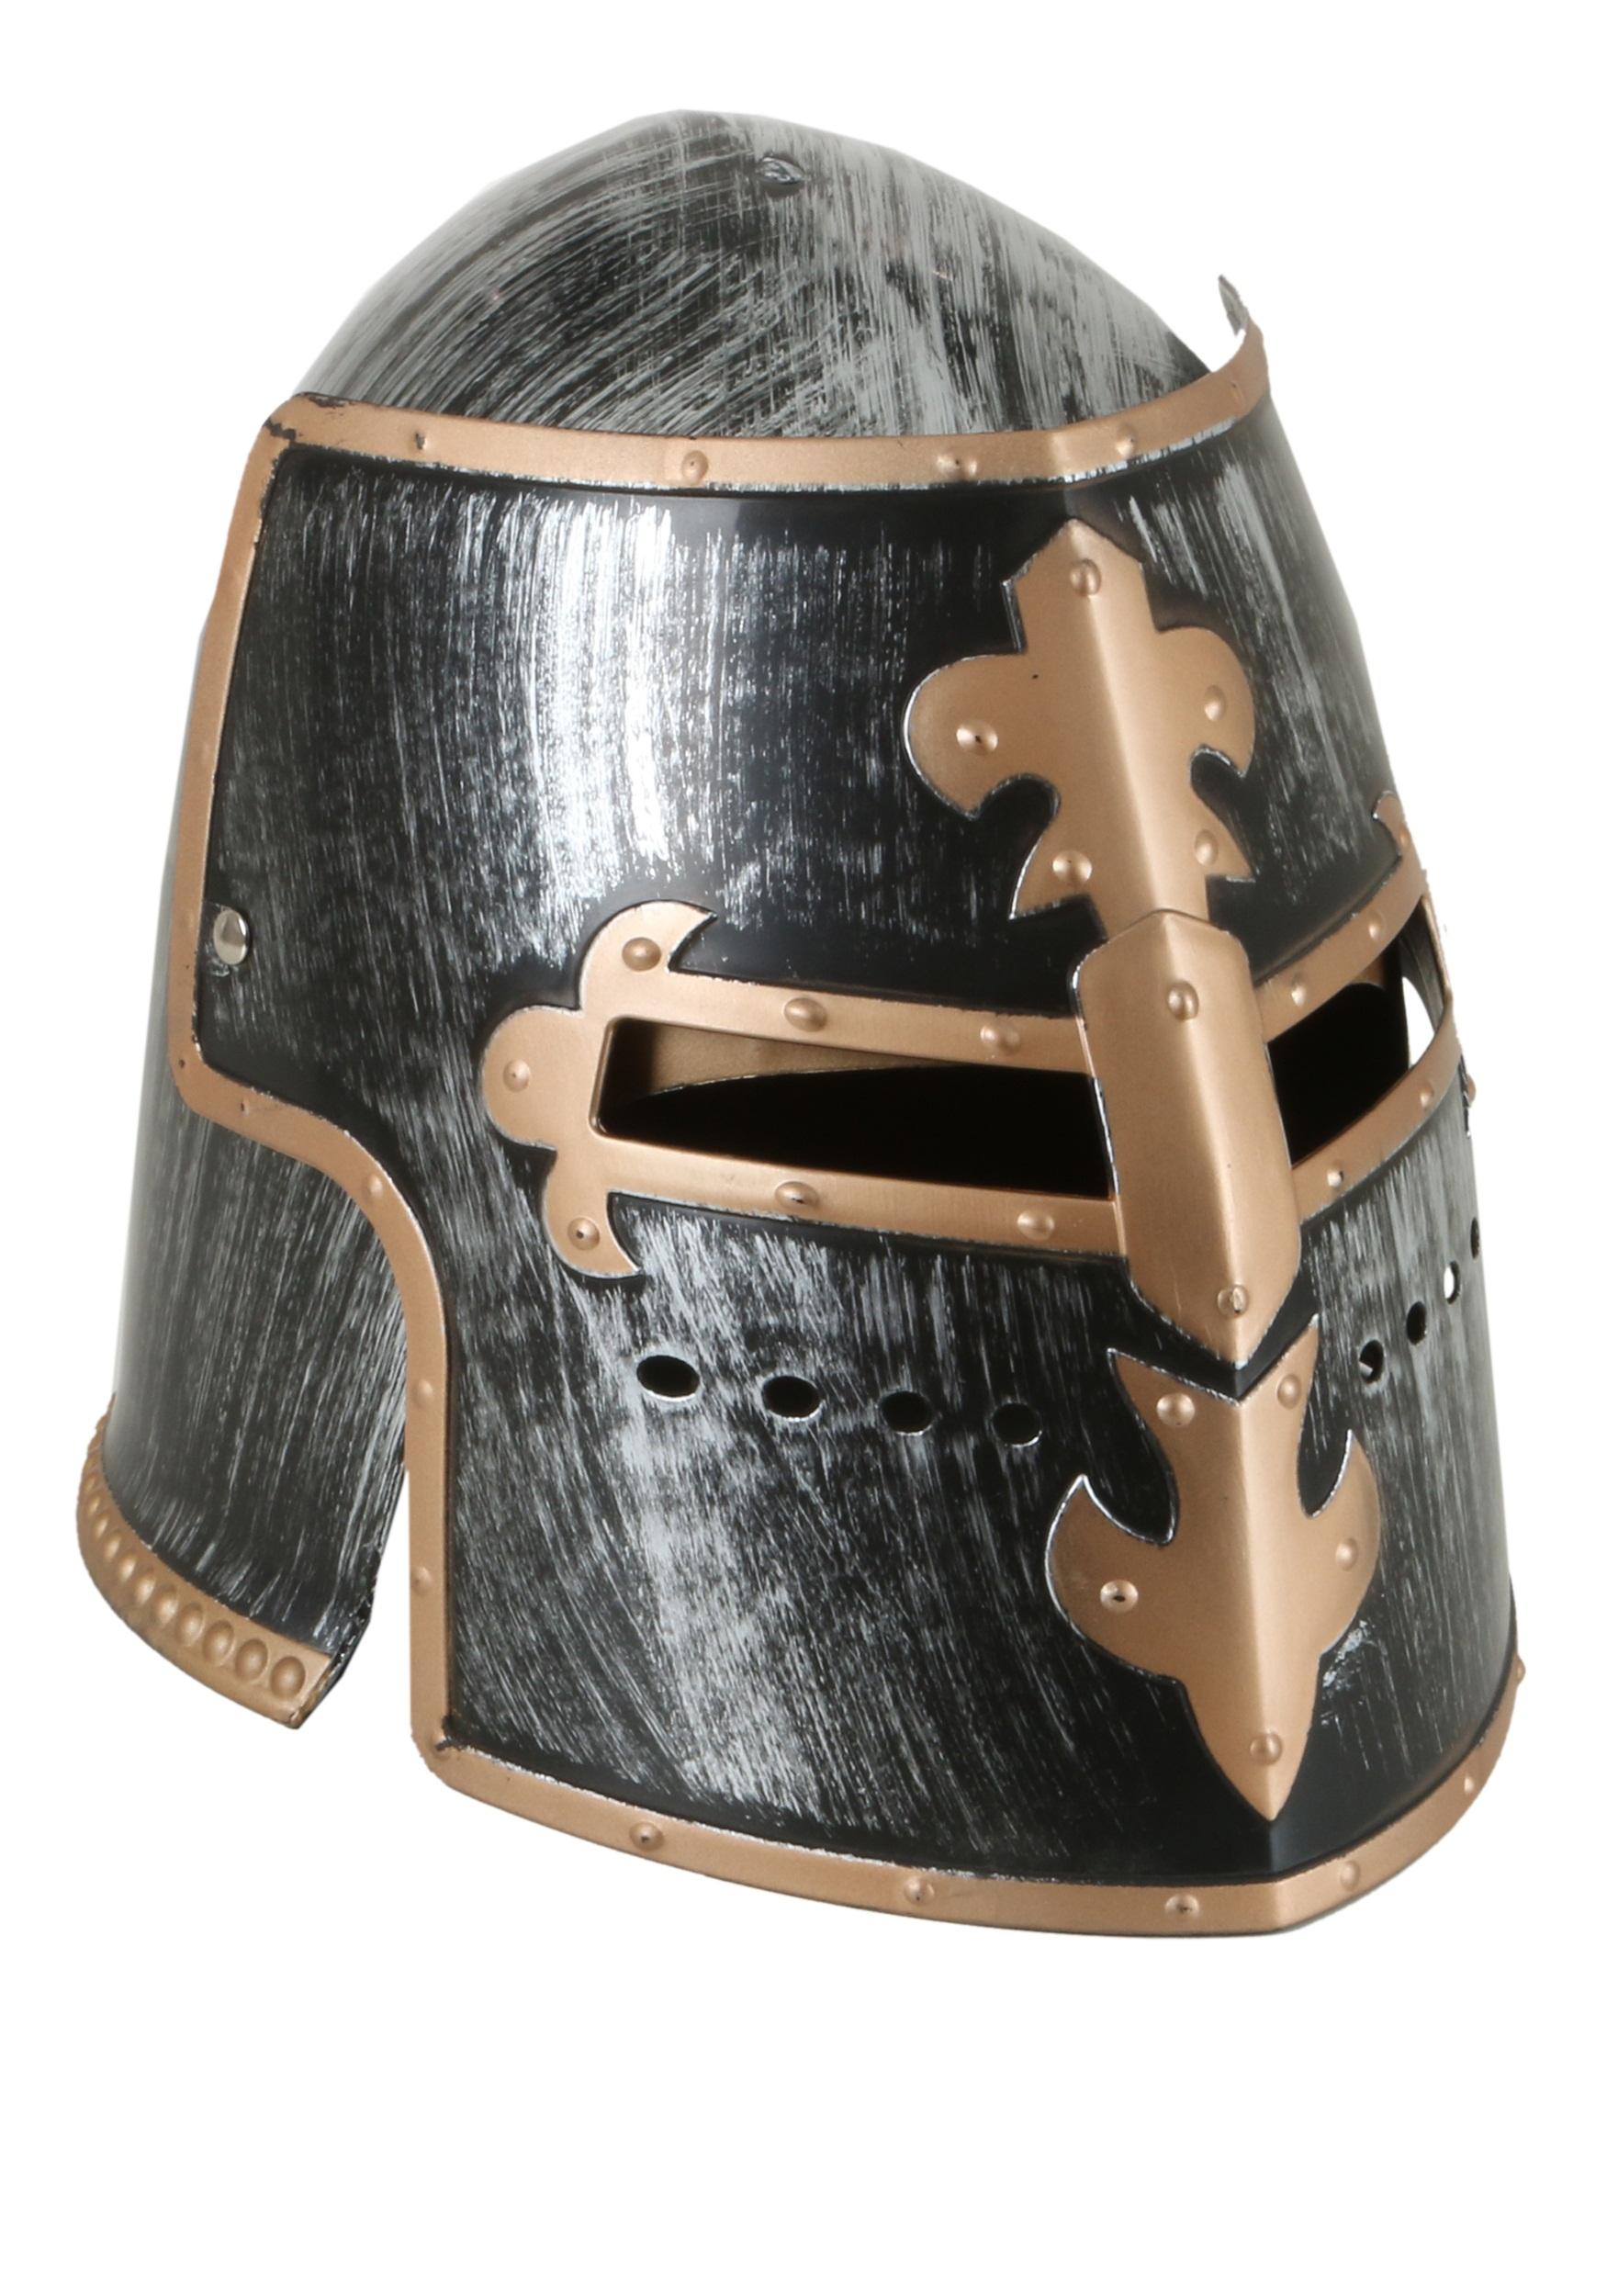 08480675d83da adult-adjustable-medieval-helmet.jpg